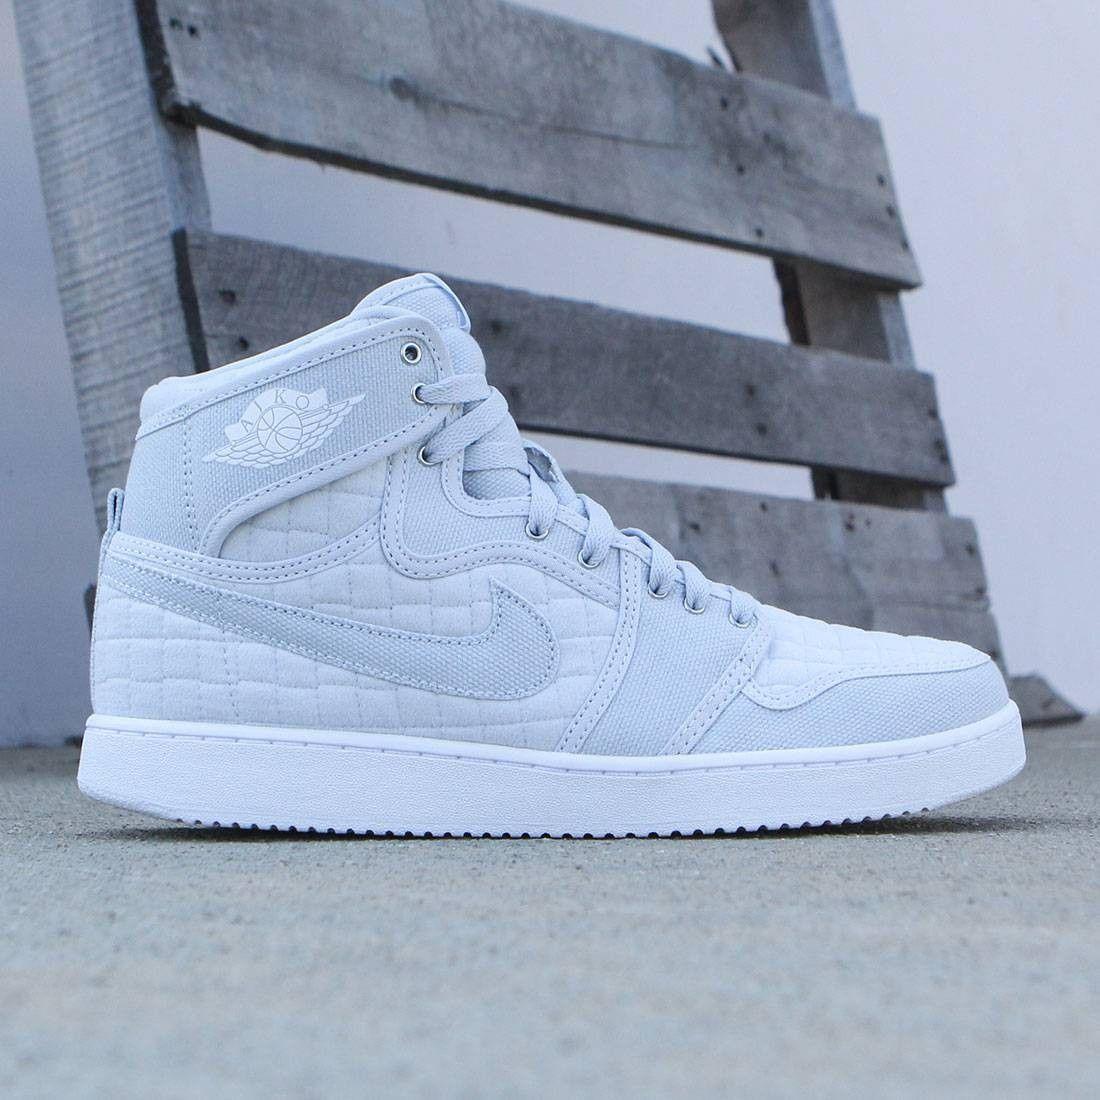 8d257f1df3d Jordan Men Air Jordan 1 KO High OG Shoe (pure platinum / white-metallic  silver)